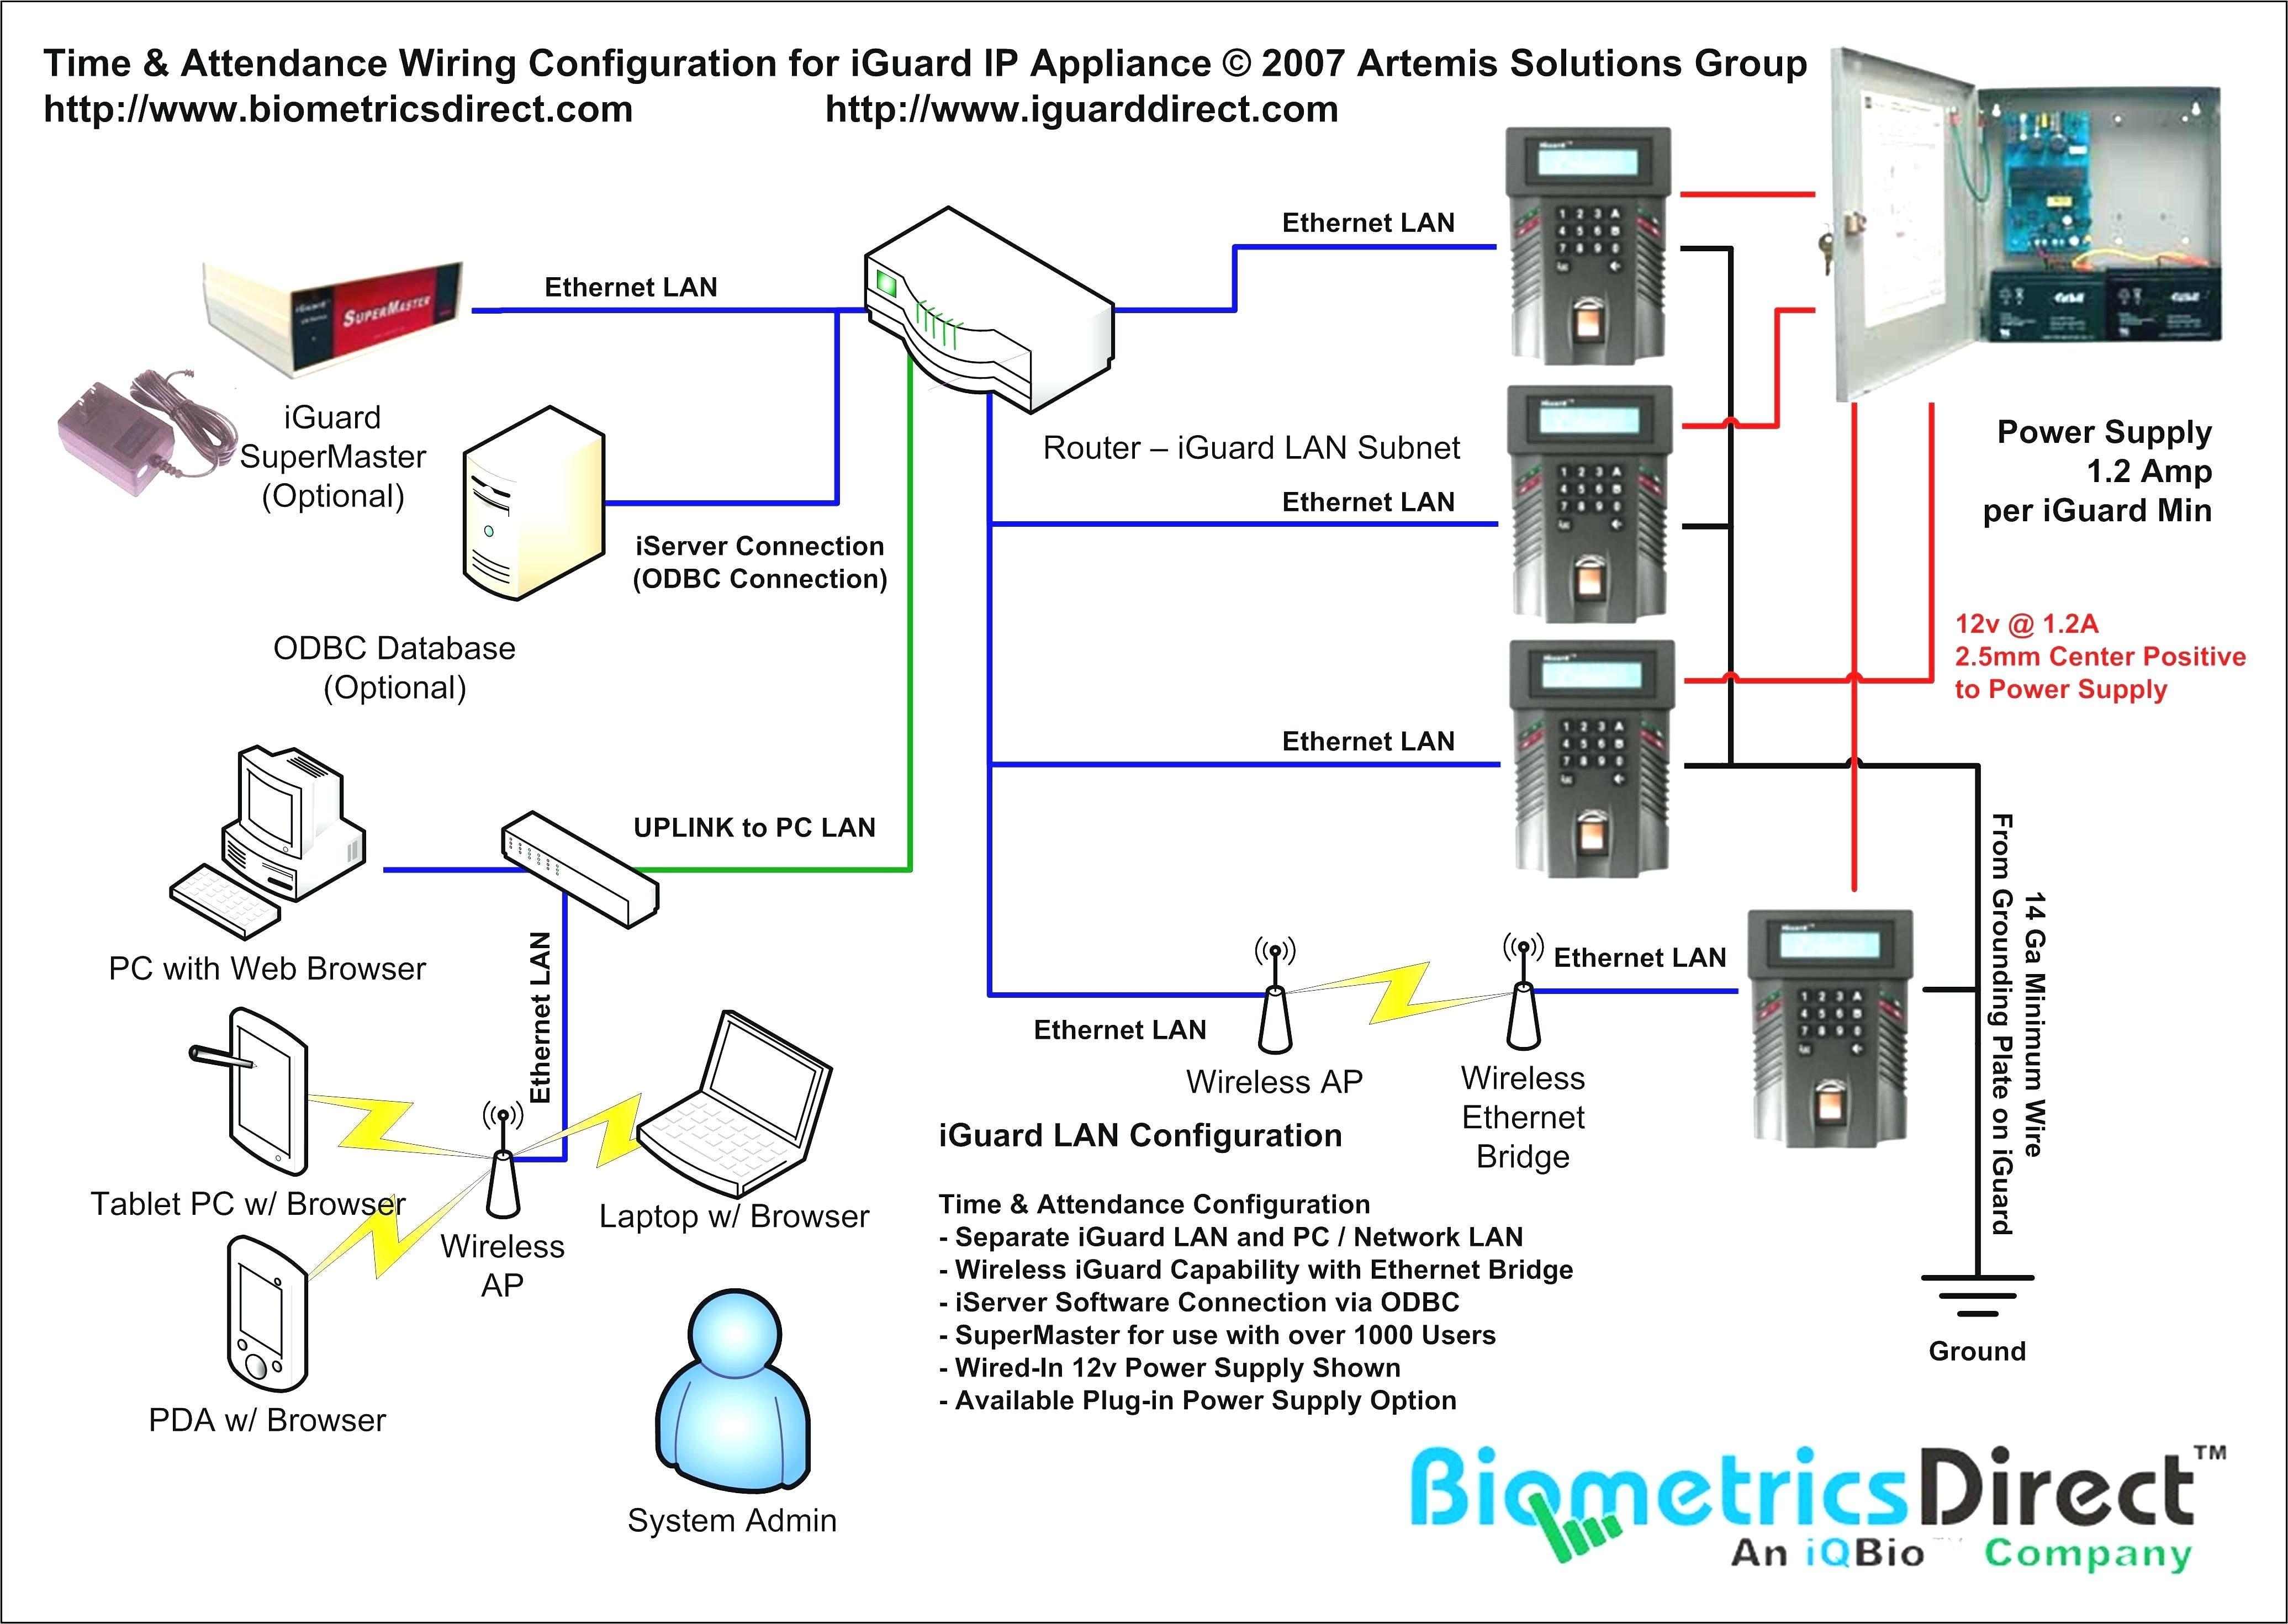 av wiring diagram software Download-Home theater Wiring Diagram software Refrence Guitar Wiring Diagram Creator Archives Kobecityinfo Best 16-k